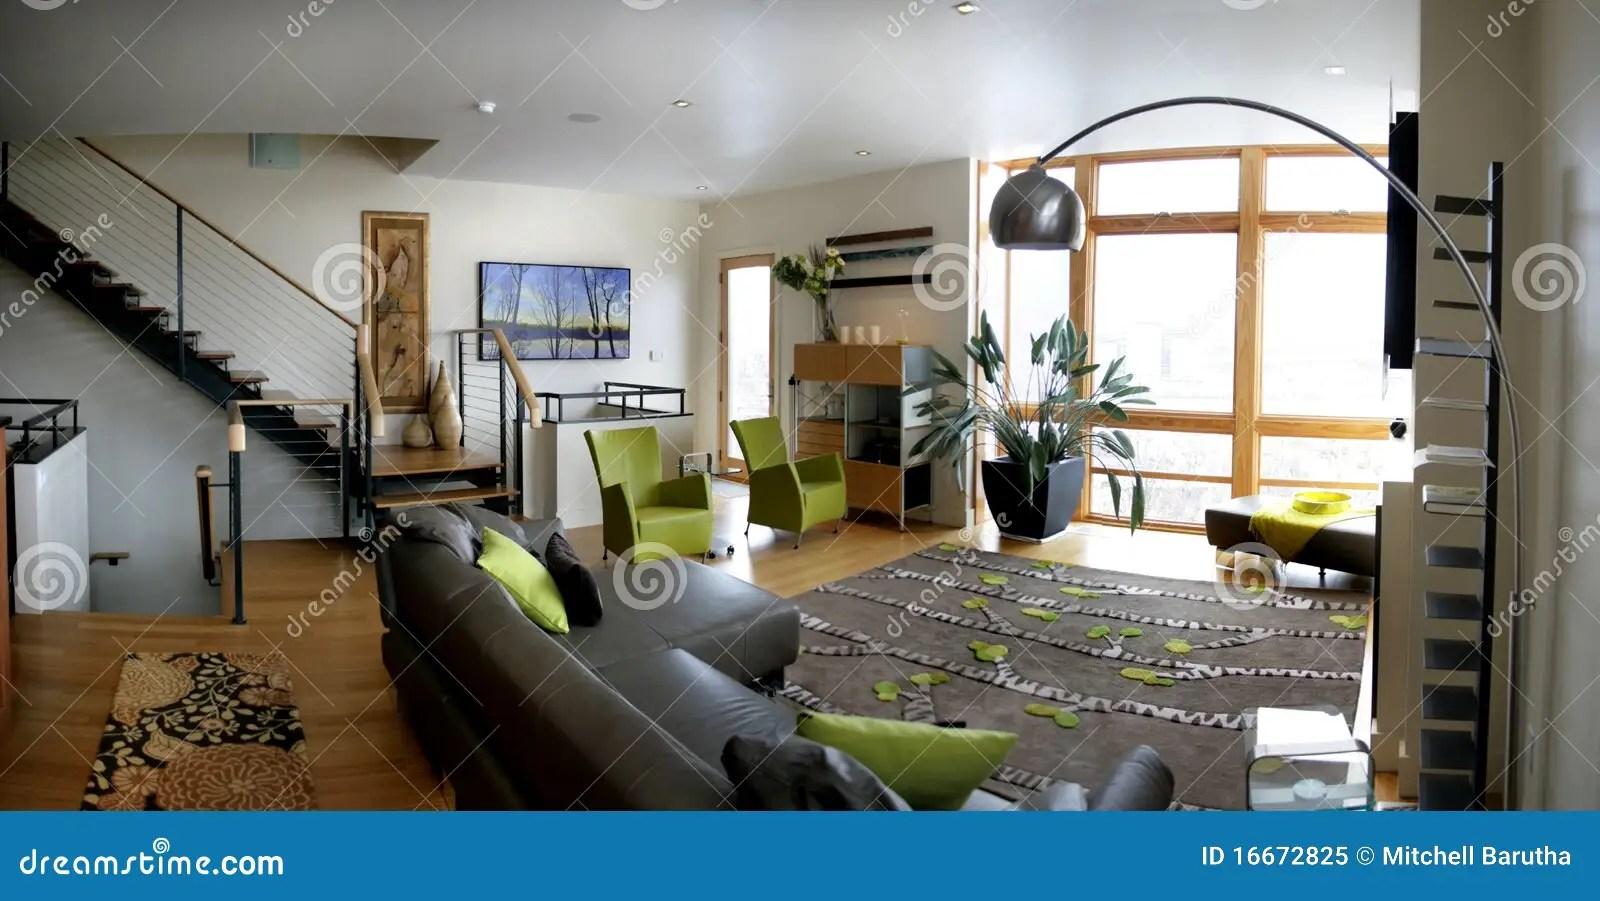 Loft Living Room Royalty Free Stock Photo Image 16672825